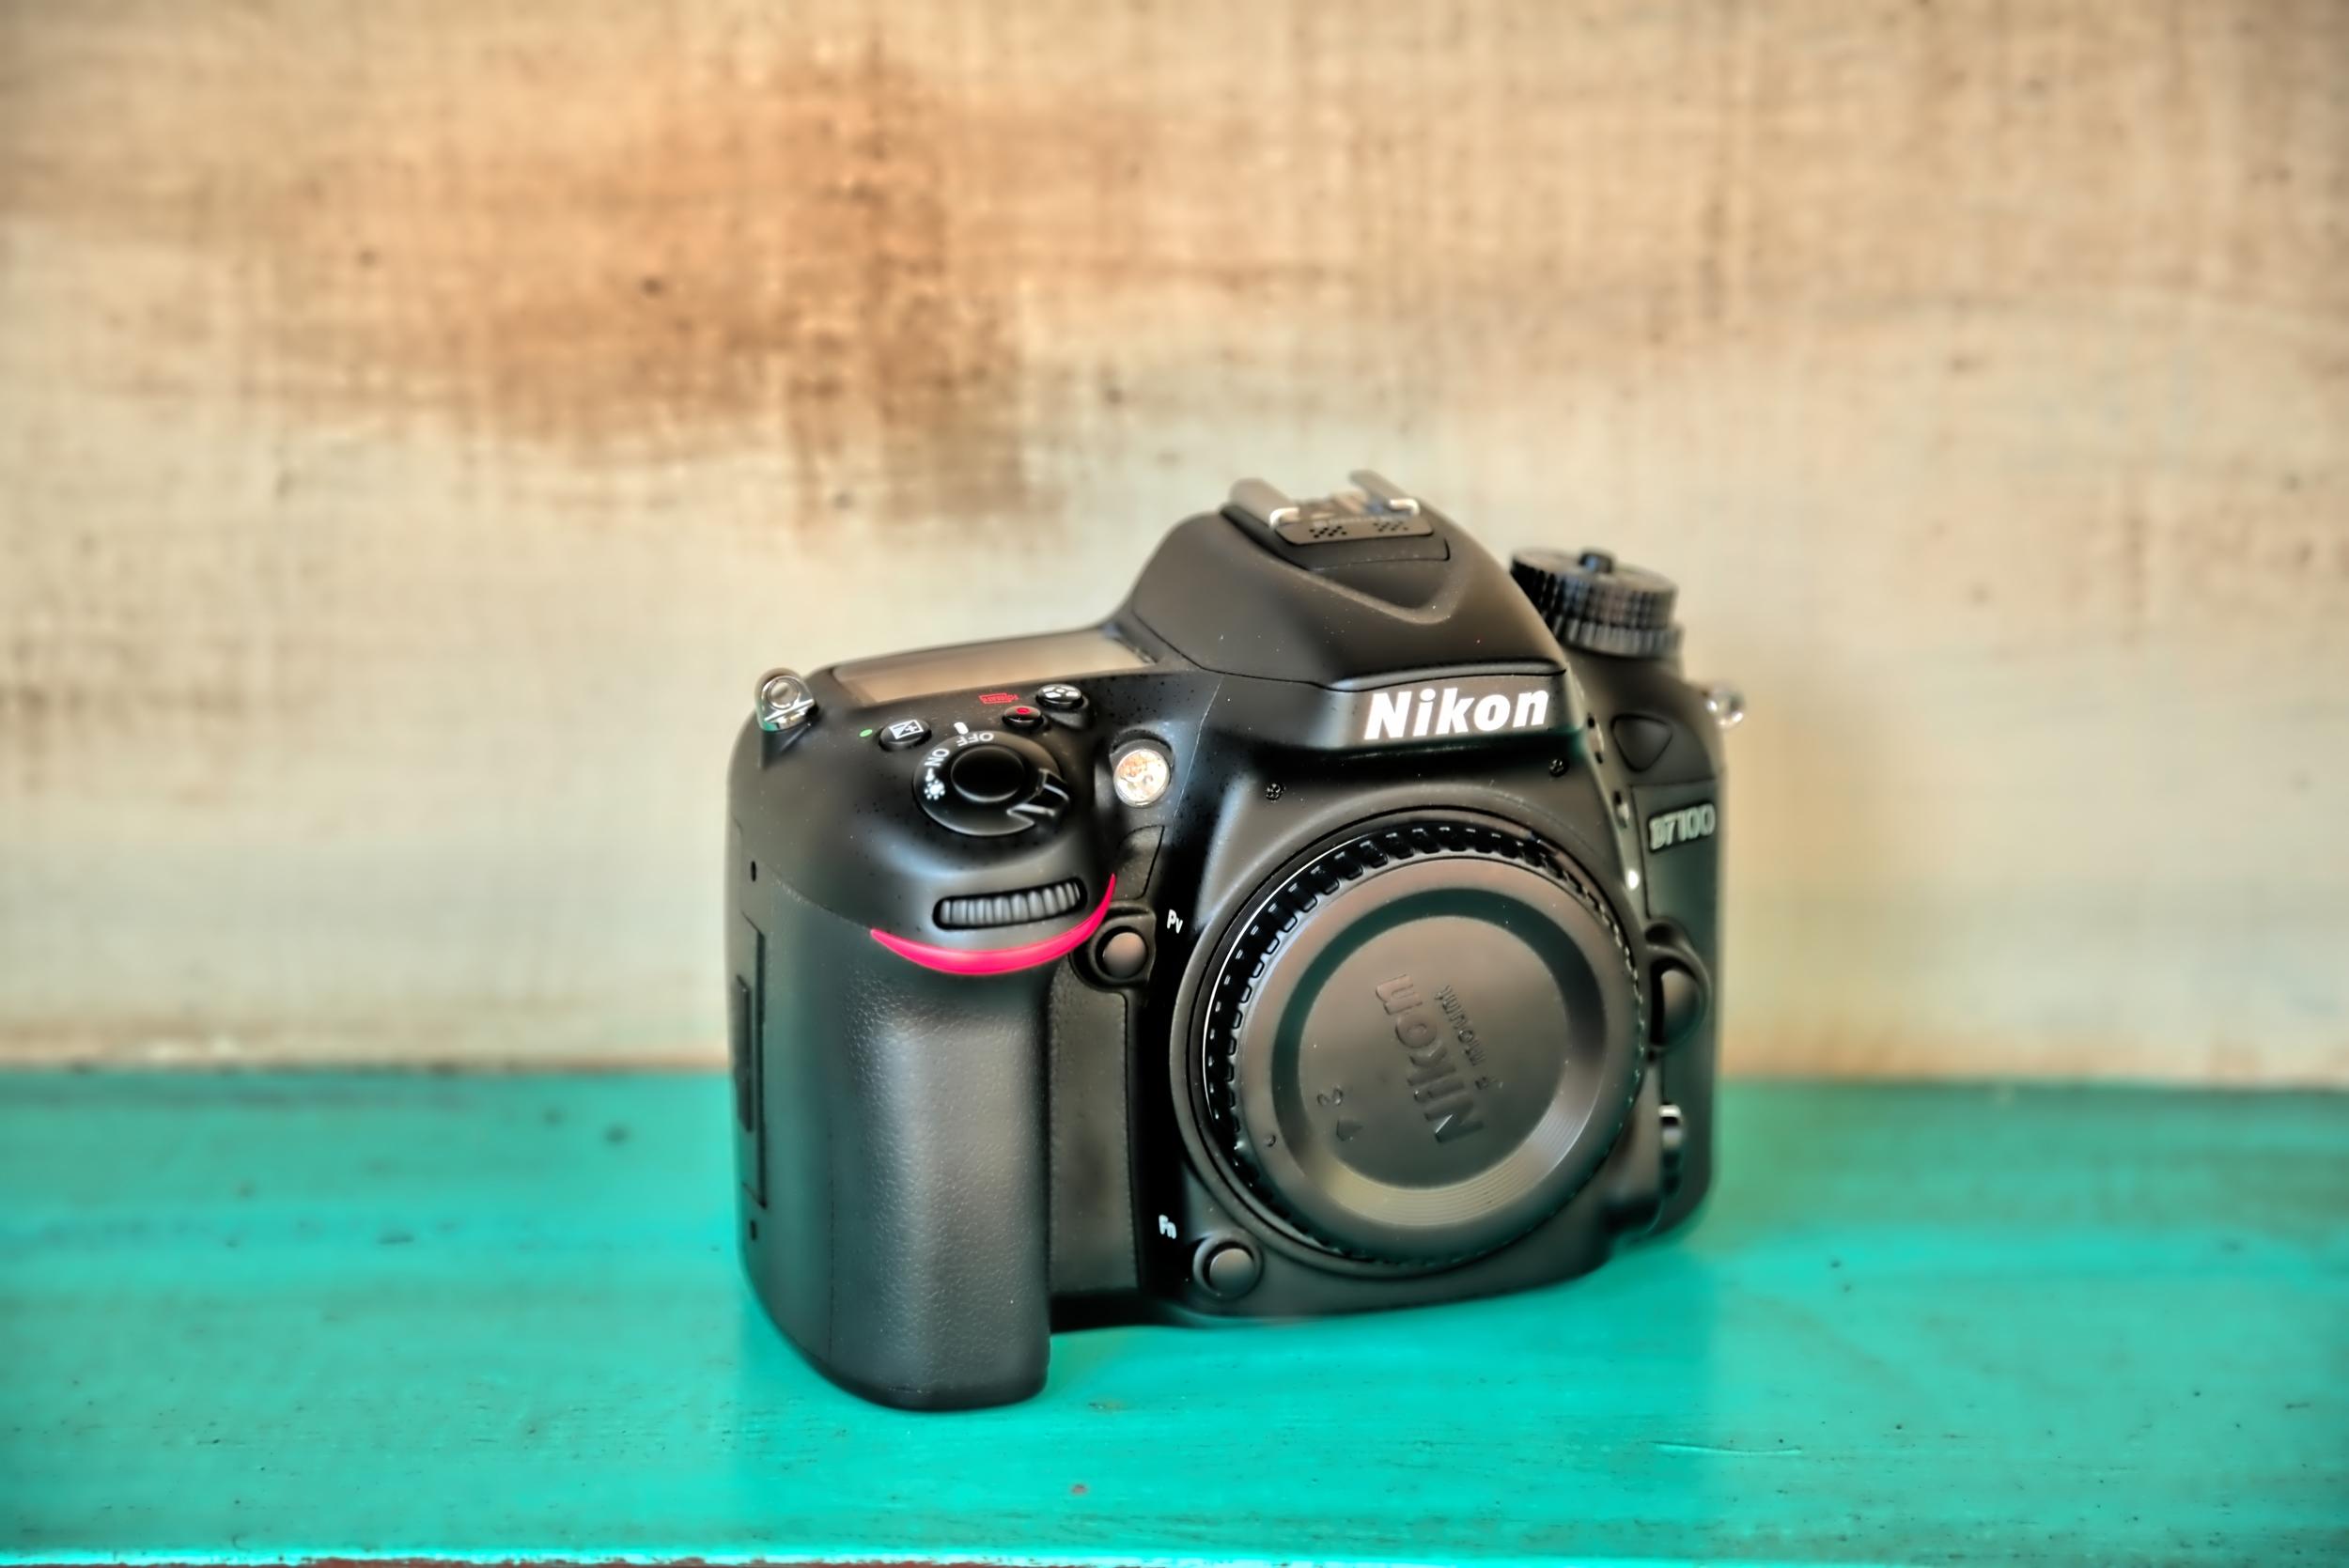 Nikon D7100 Full Frame DSLR Camera